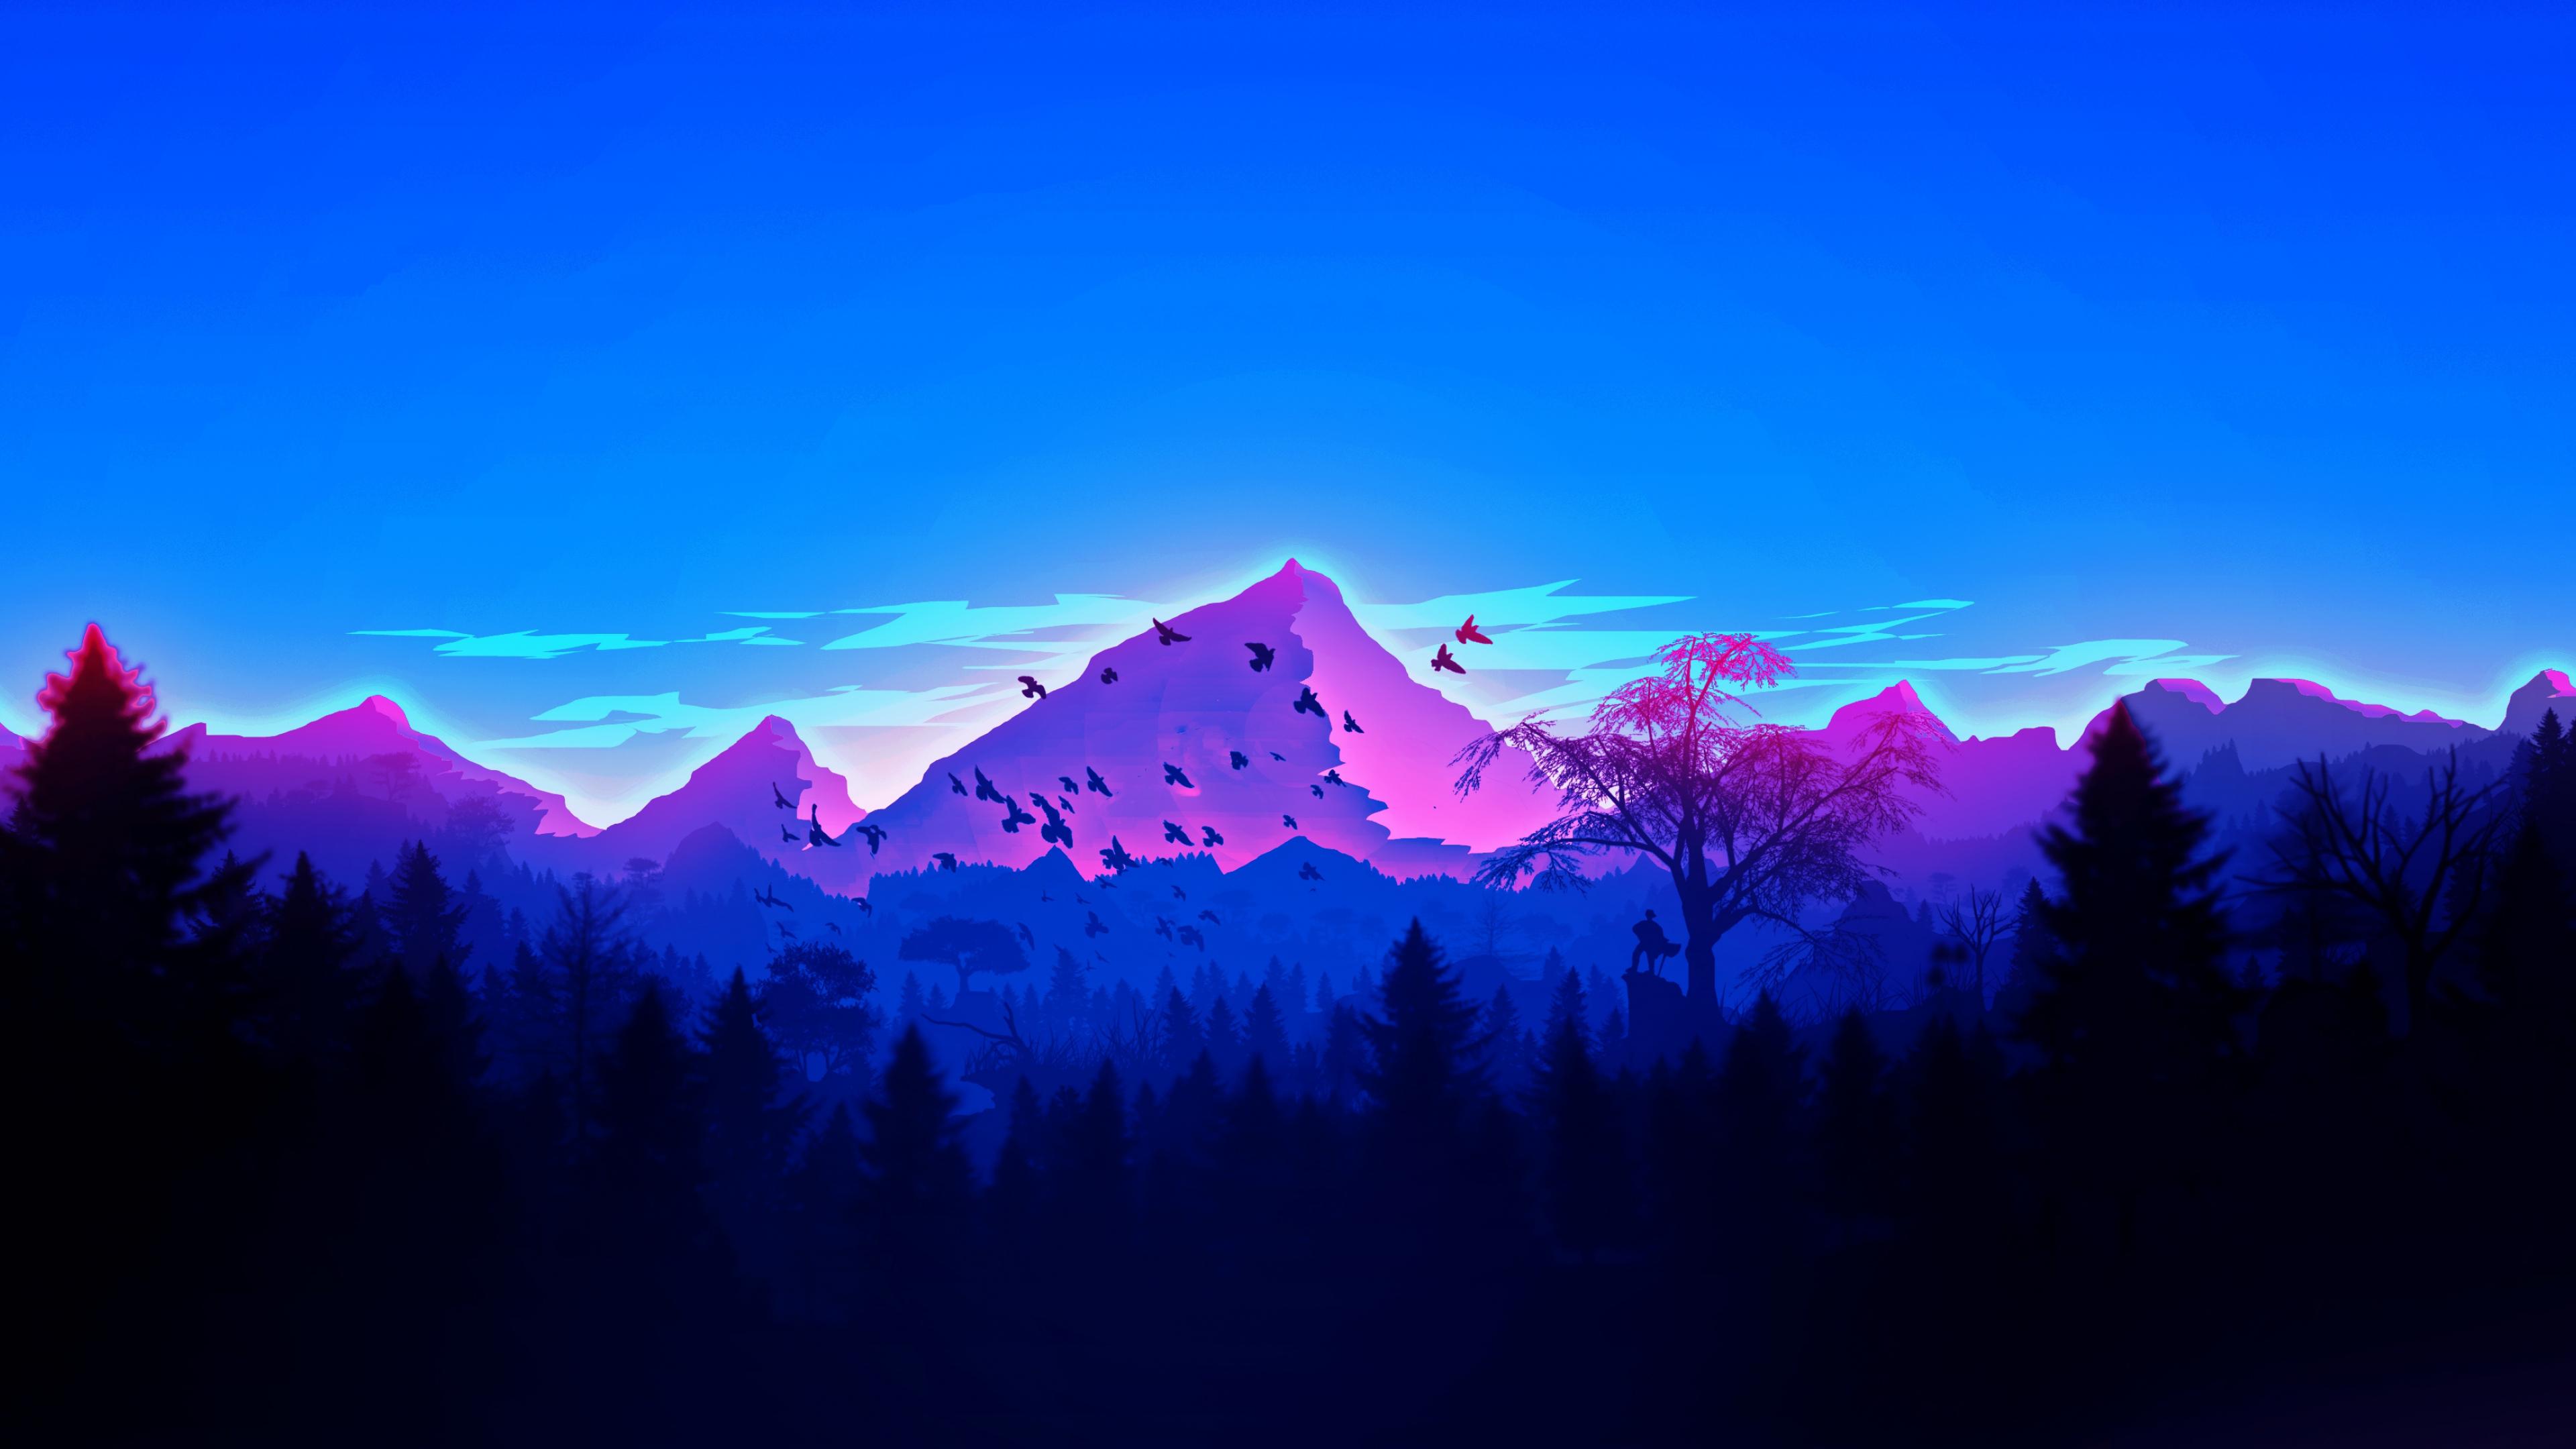 Download 3840x2160 wallpaper mountain, peaks, birds ...